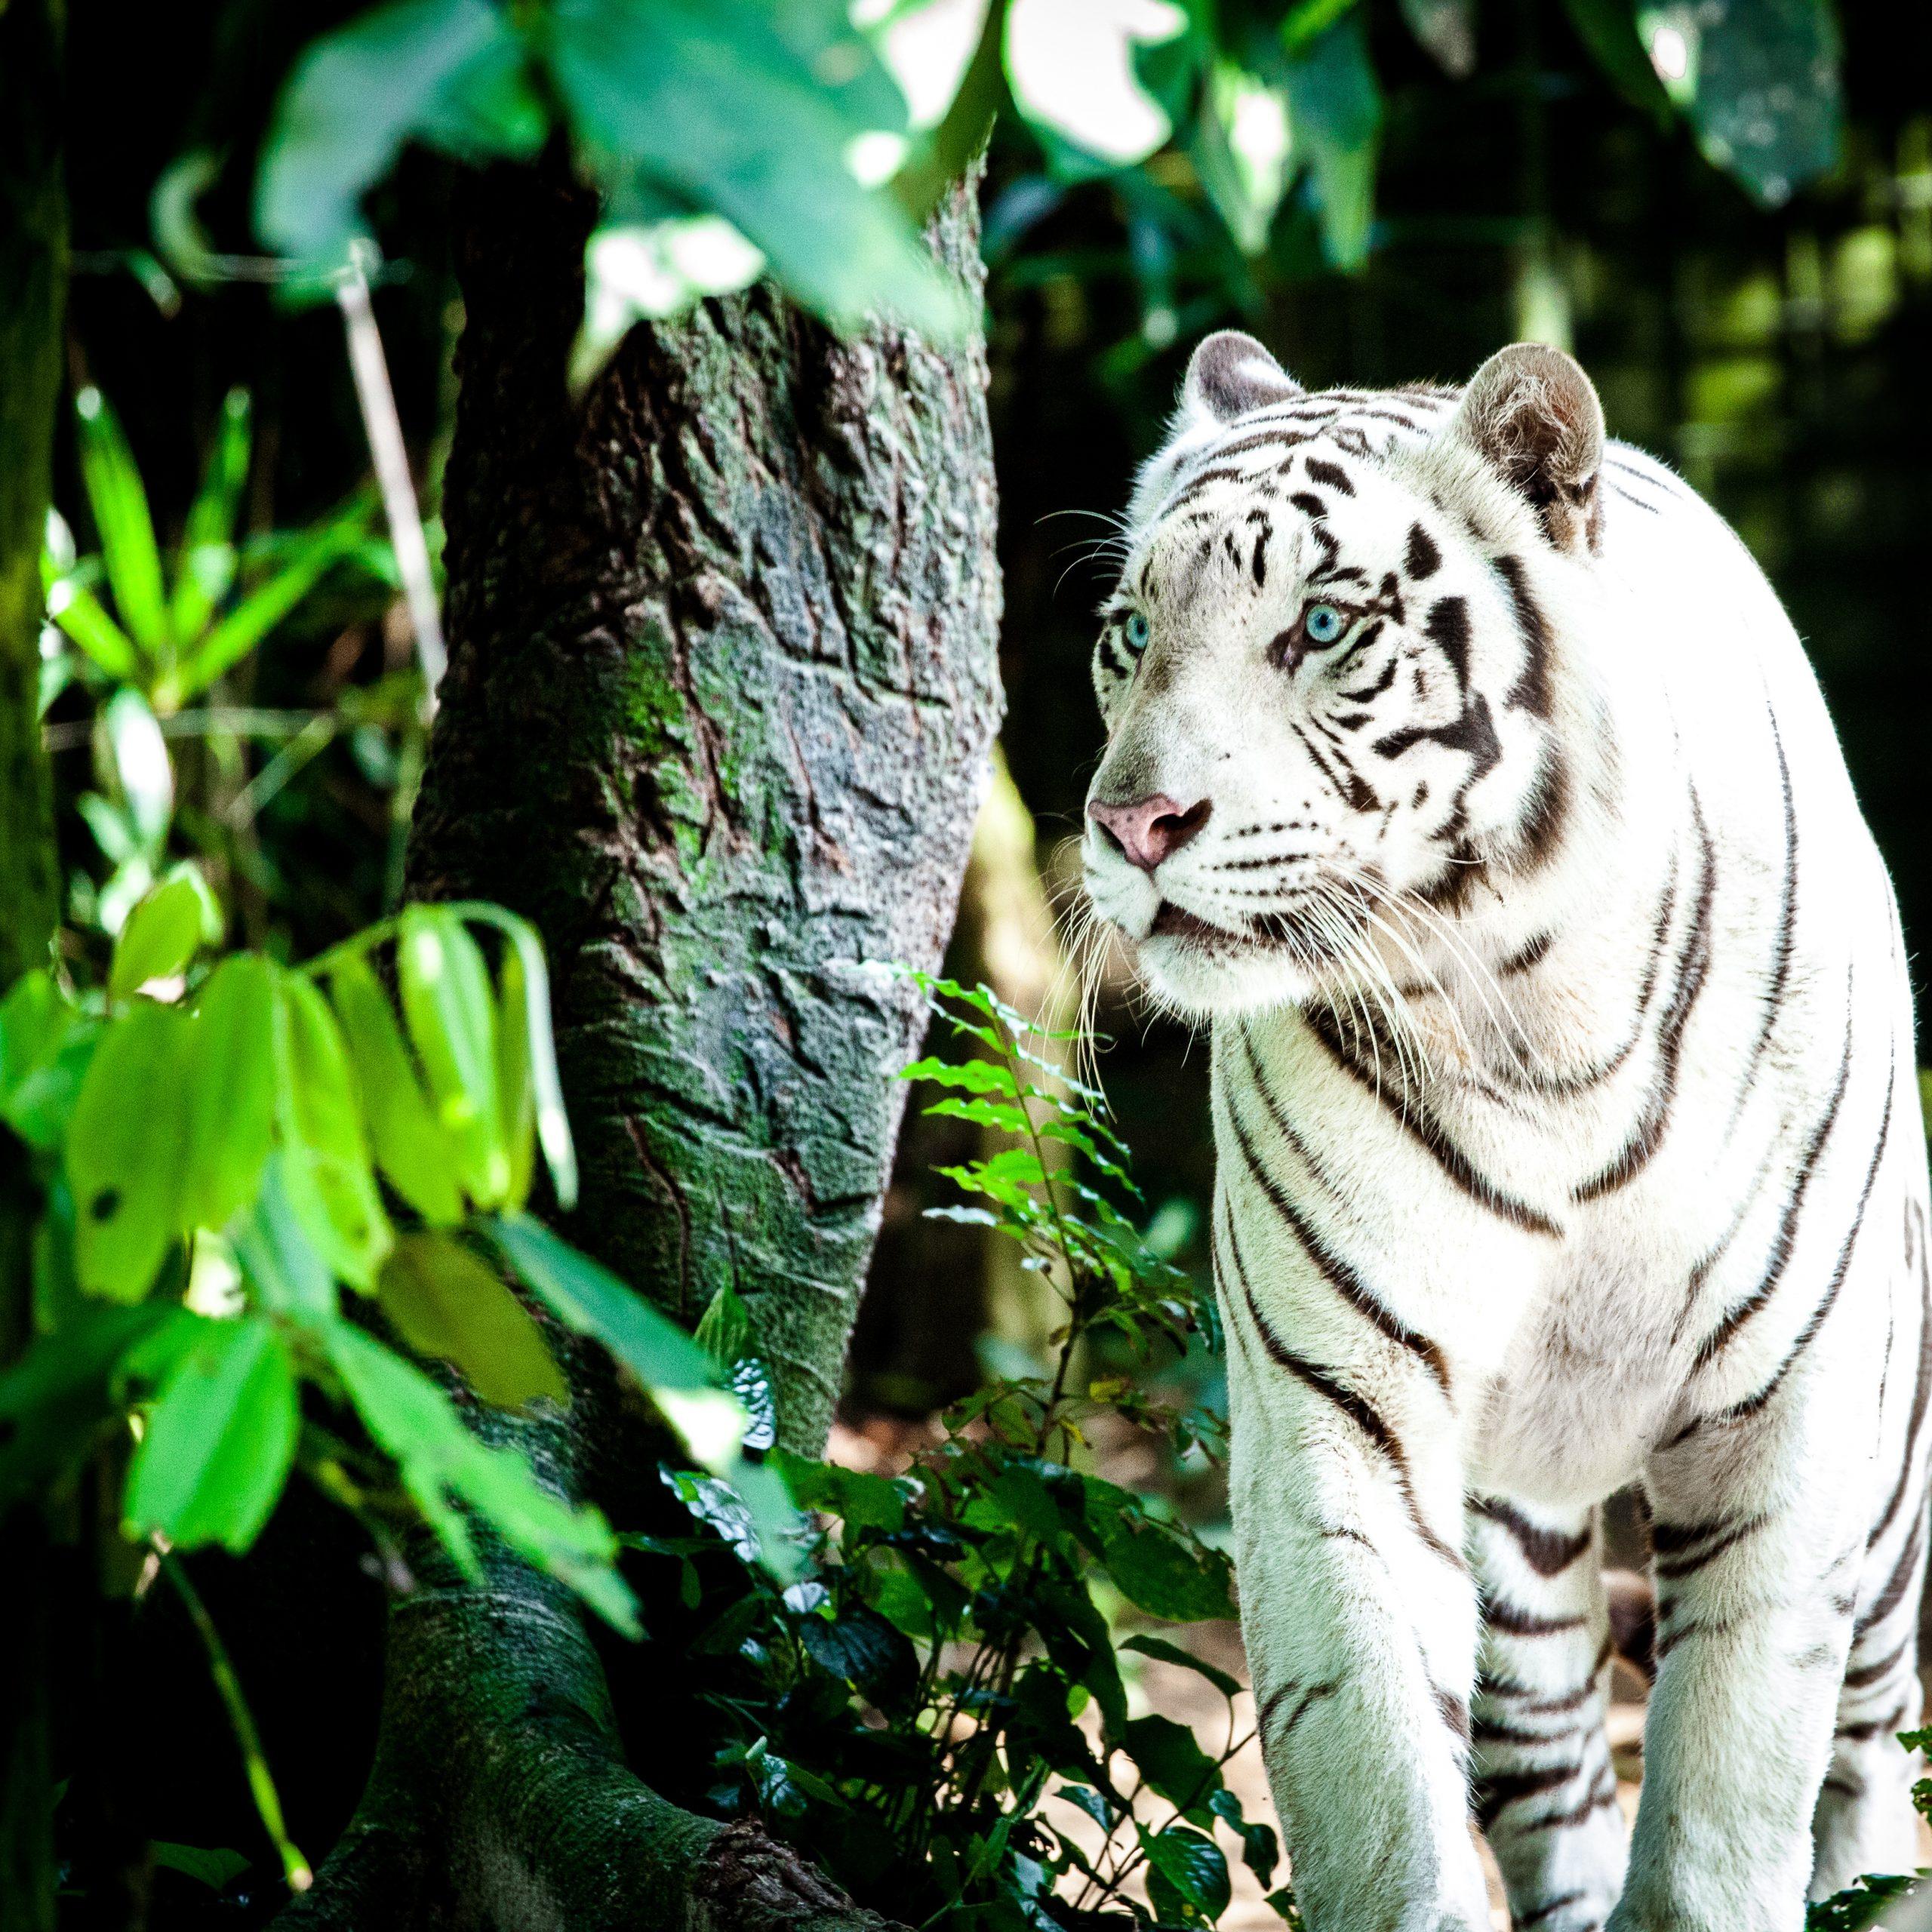 Wild Tiger Hd Wallpaper Beautiful White Tiger Hunting 4k Uhd Wallpaper